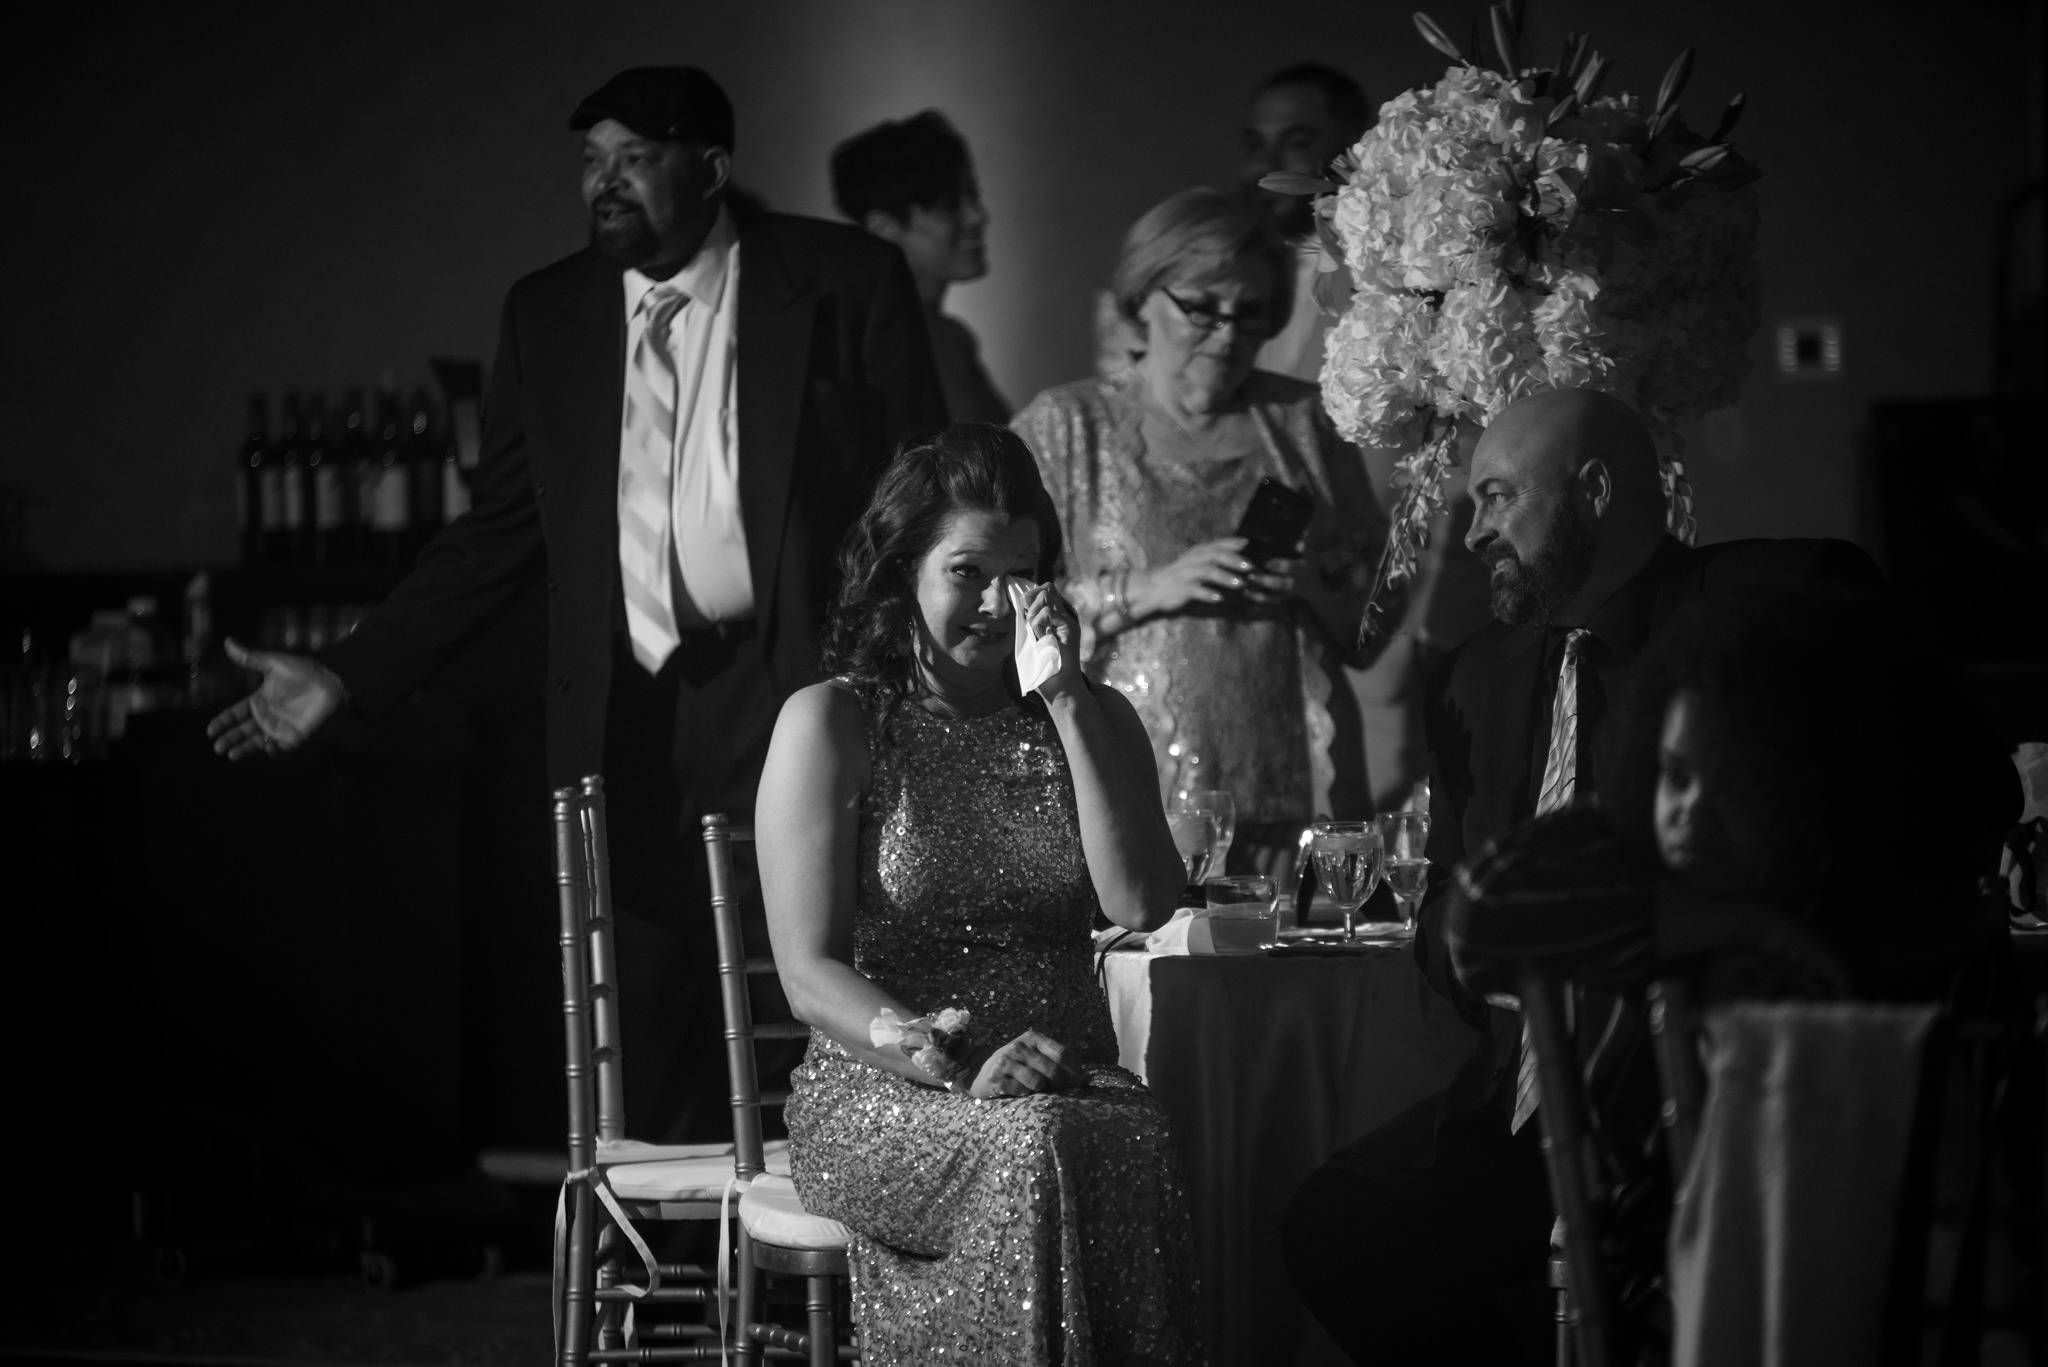 HILTON-OMAHA-WEDDING-PHOTOGRAPHER-JM-STUDIOS-OMAHA-LIV-BRICE-036.jpg